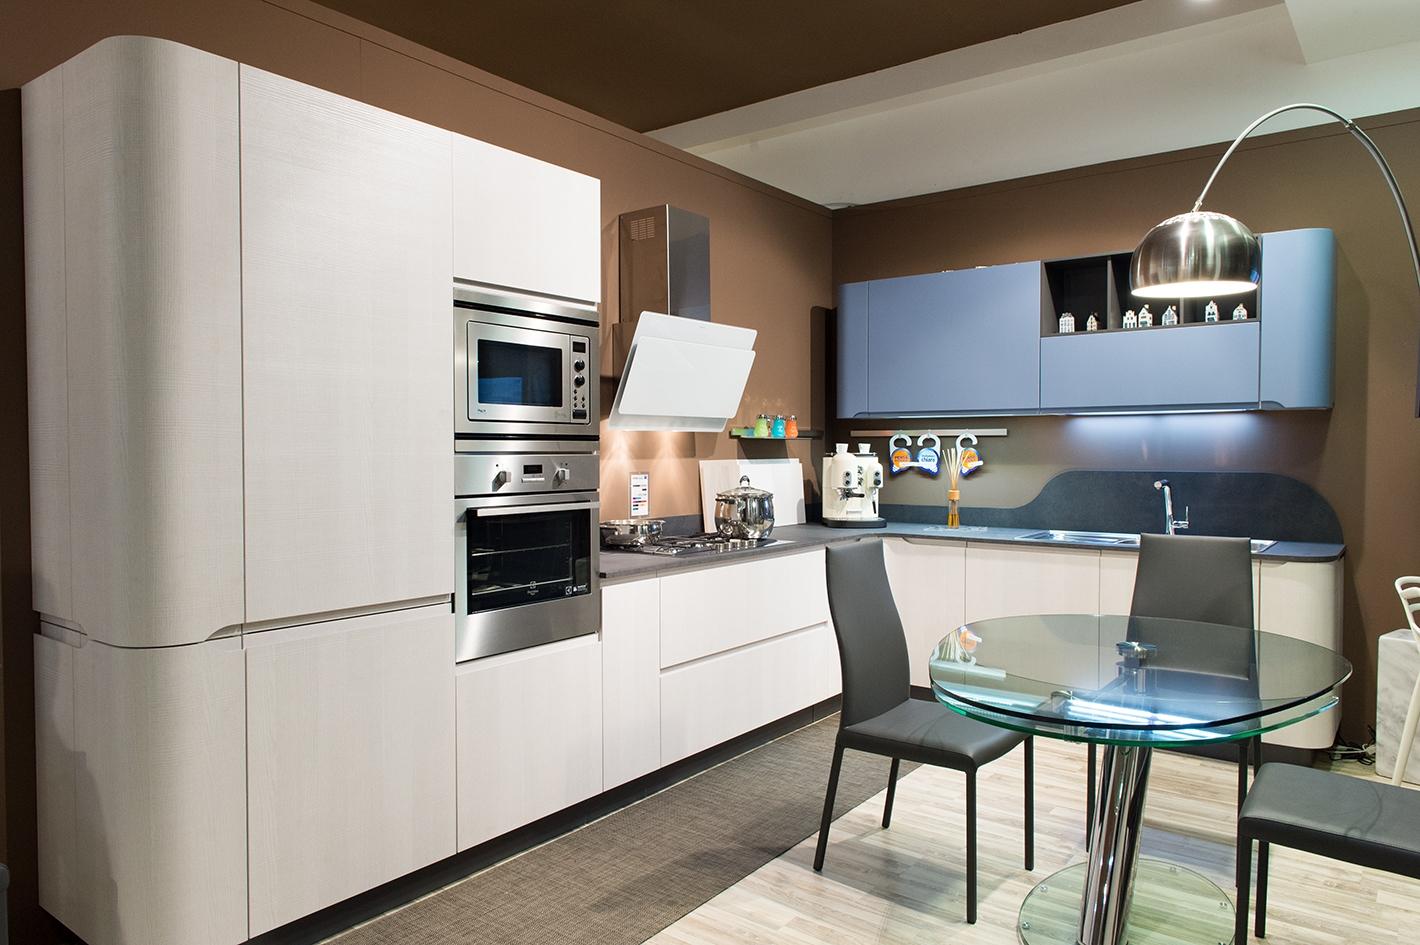 Cucina stosa bring completa di elettrodomestici 20983 - Disposizione elettrodomestici cucina ...